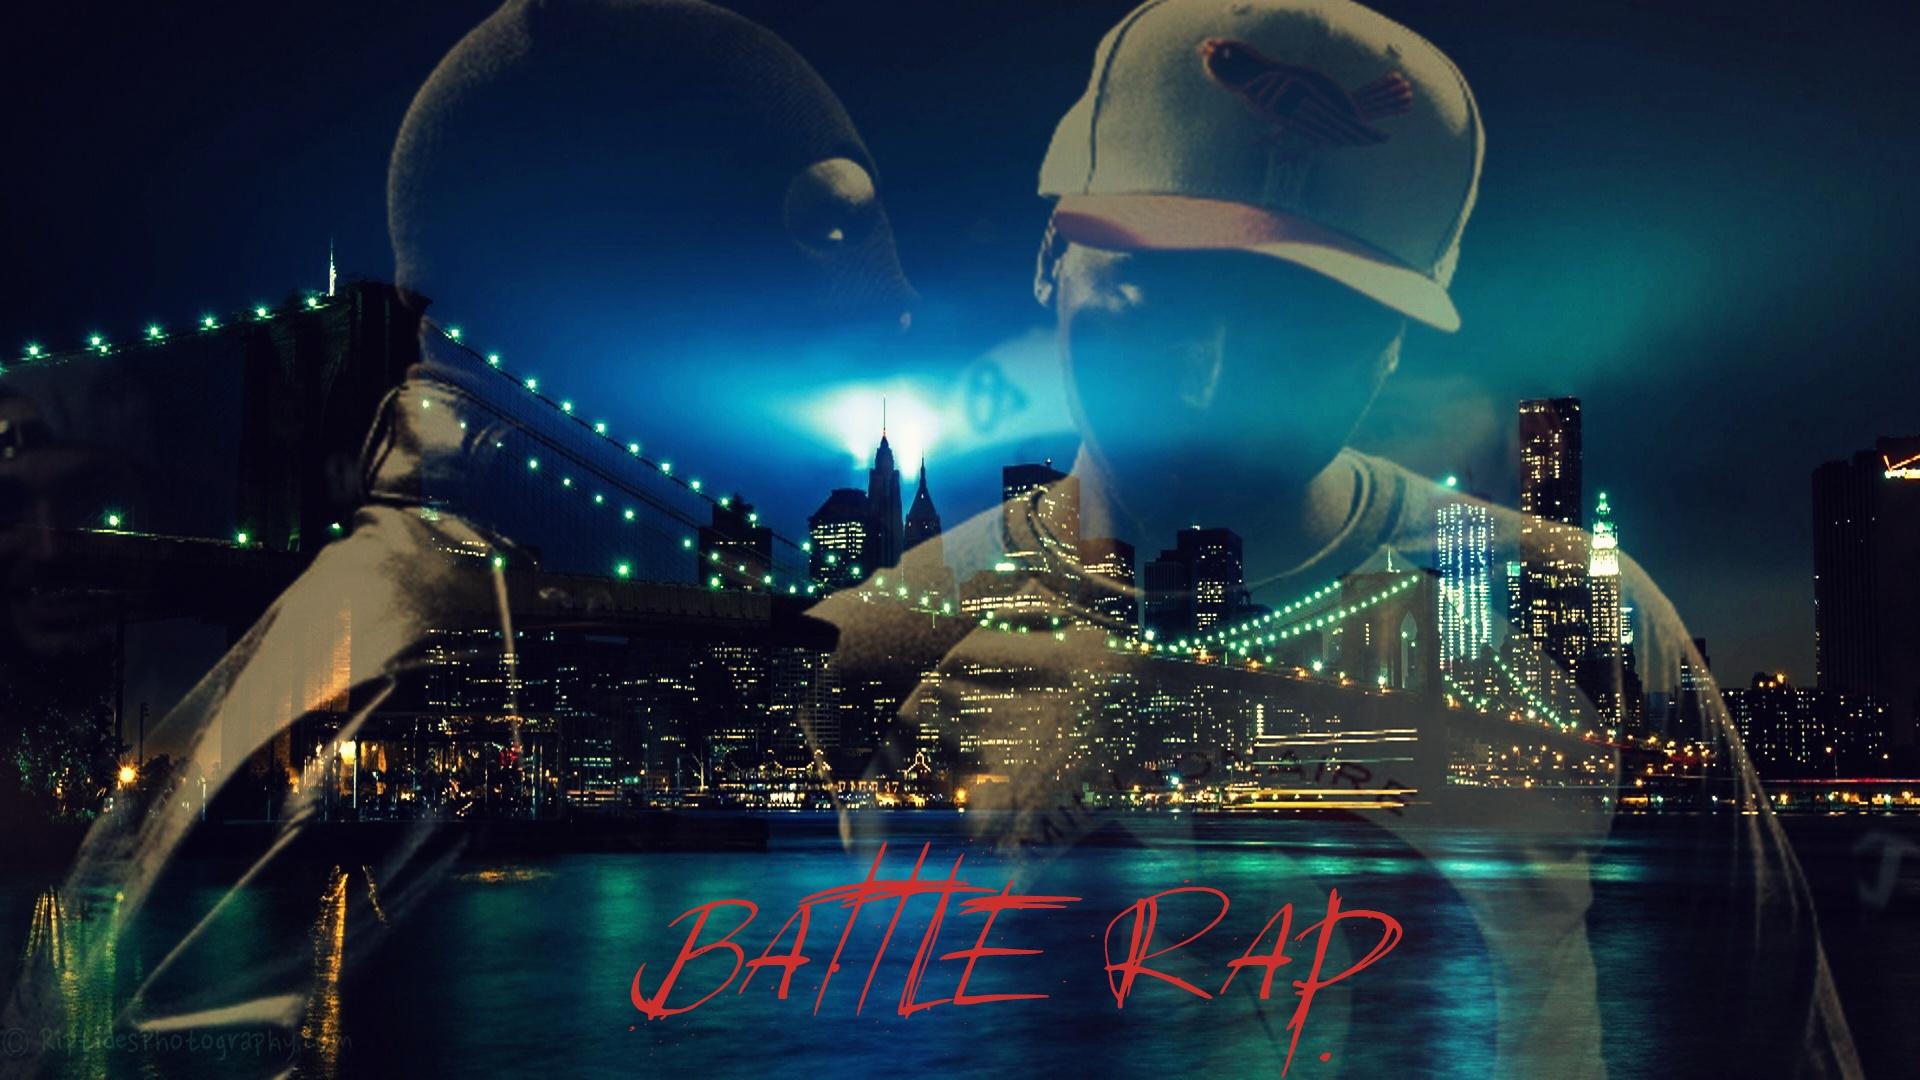 Poetic Rap Justice - 7